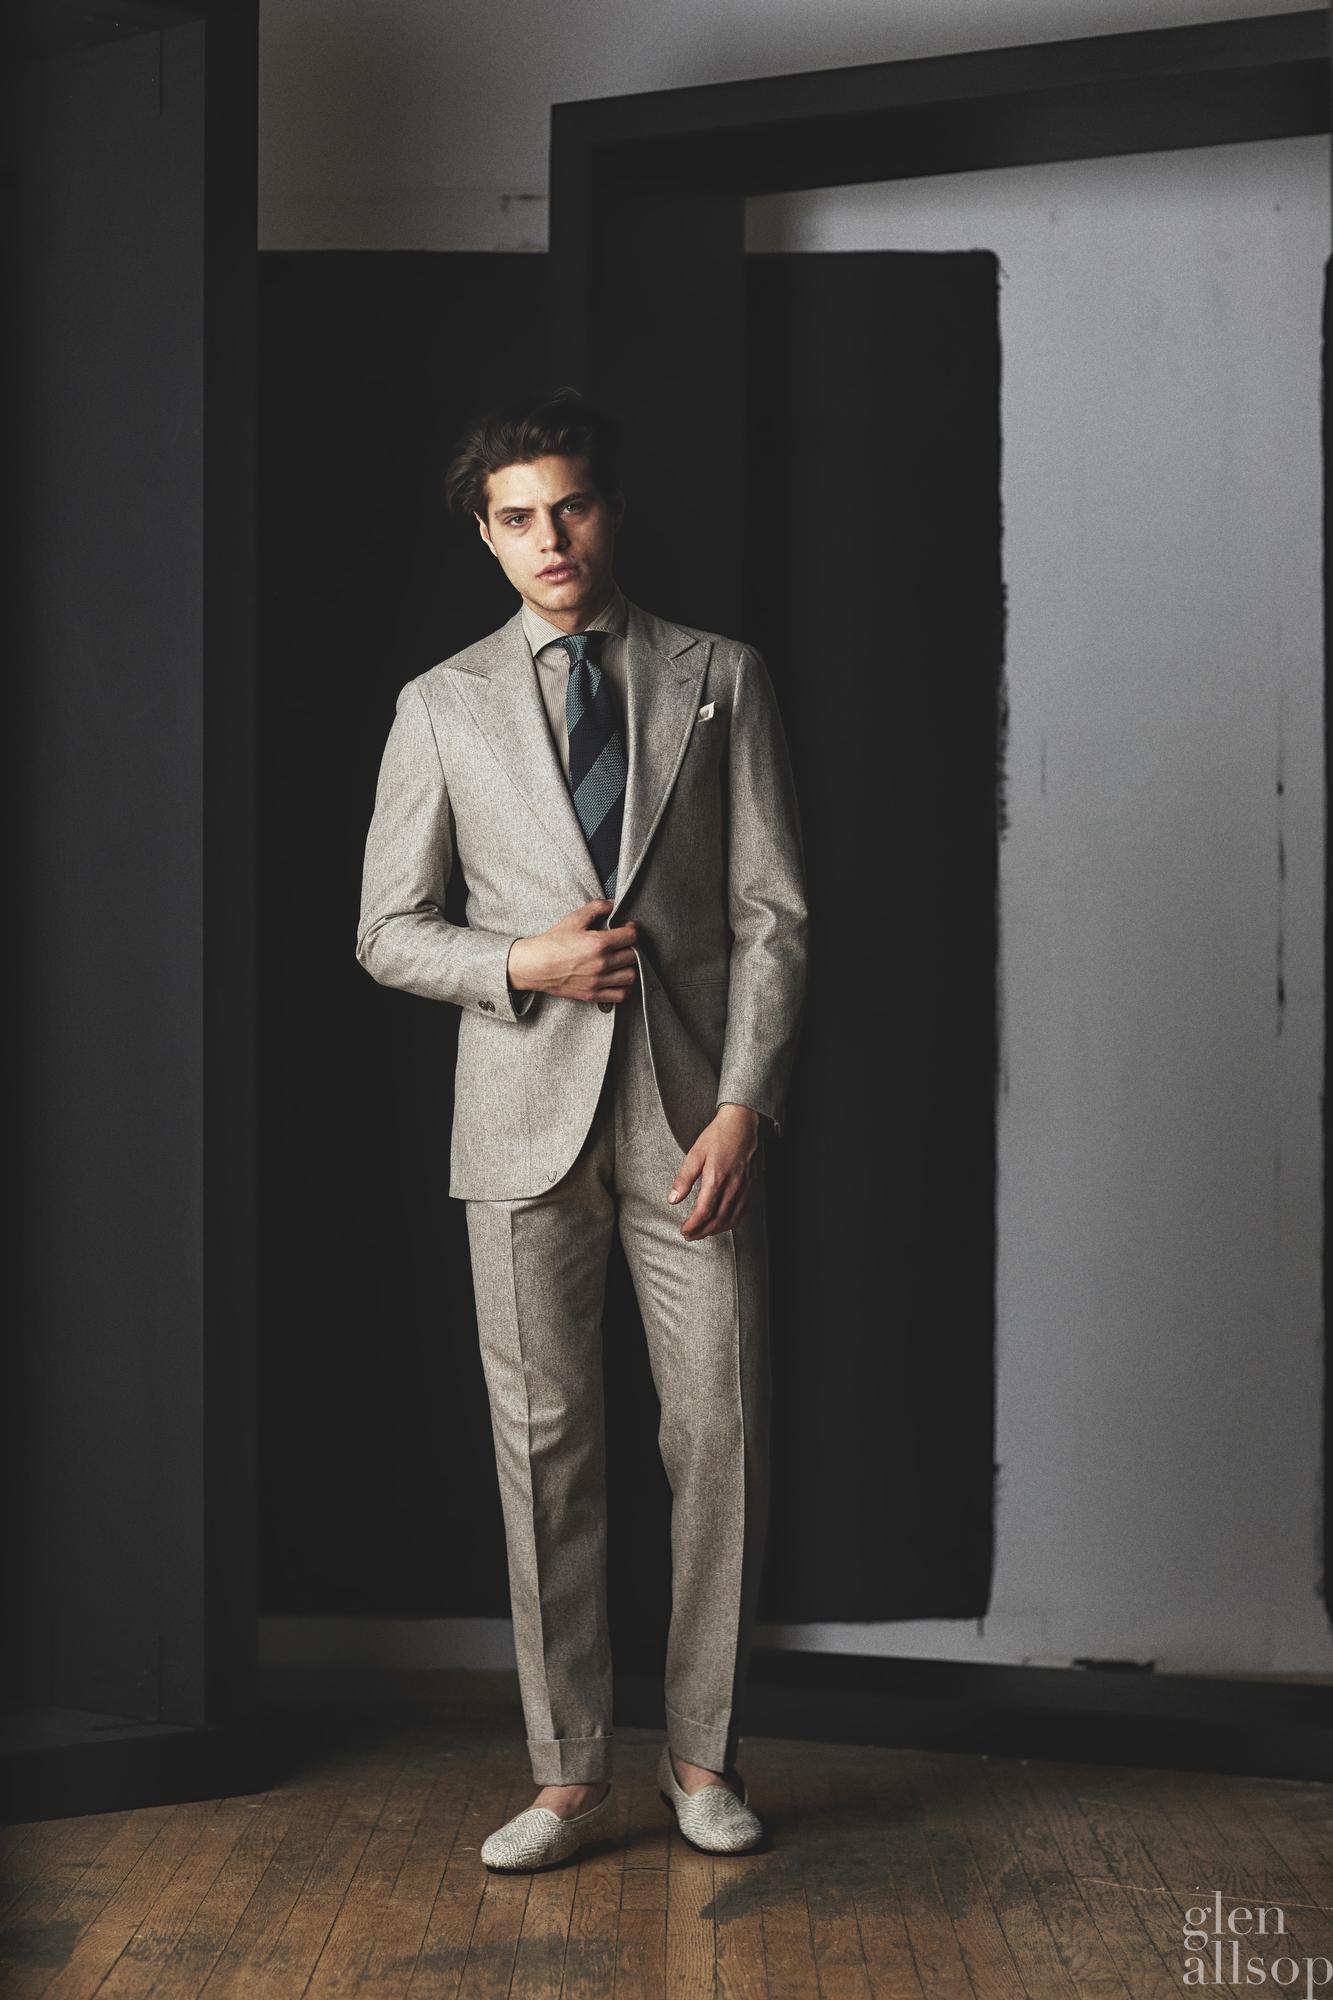 lookbook 5-eidos-nyfwm-menswear-suit-antonino russo-model